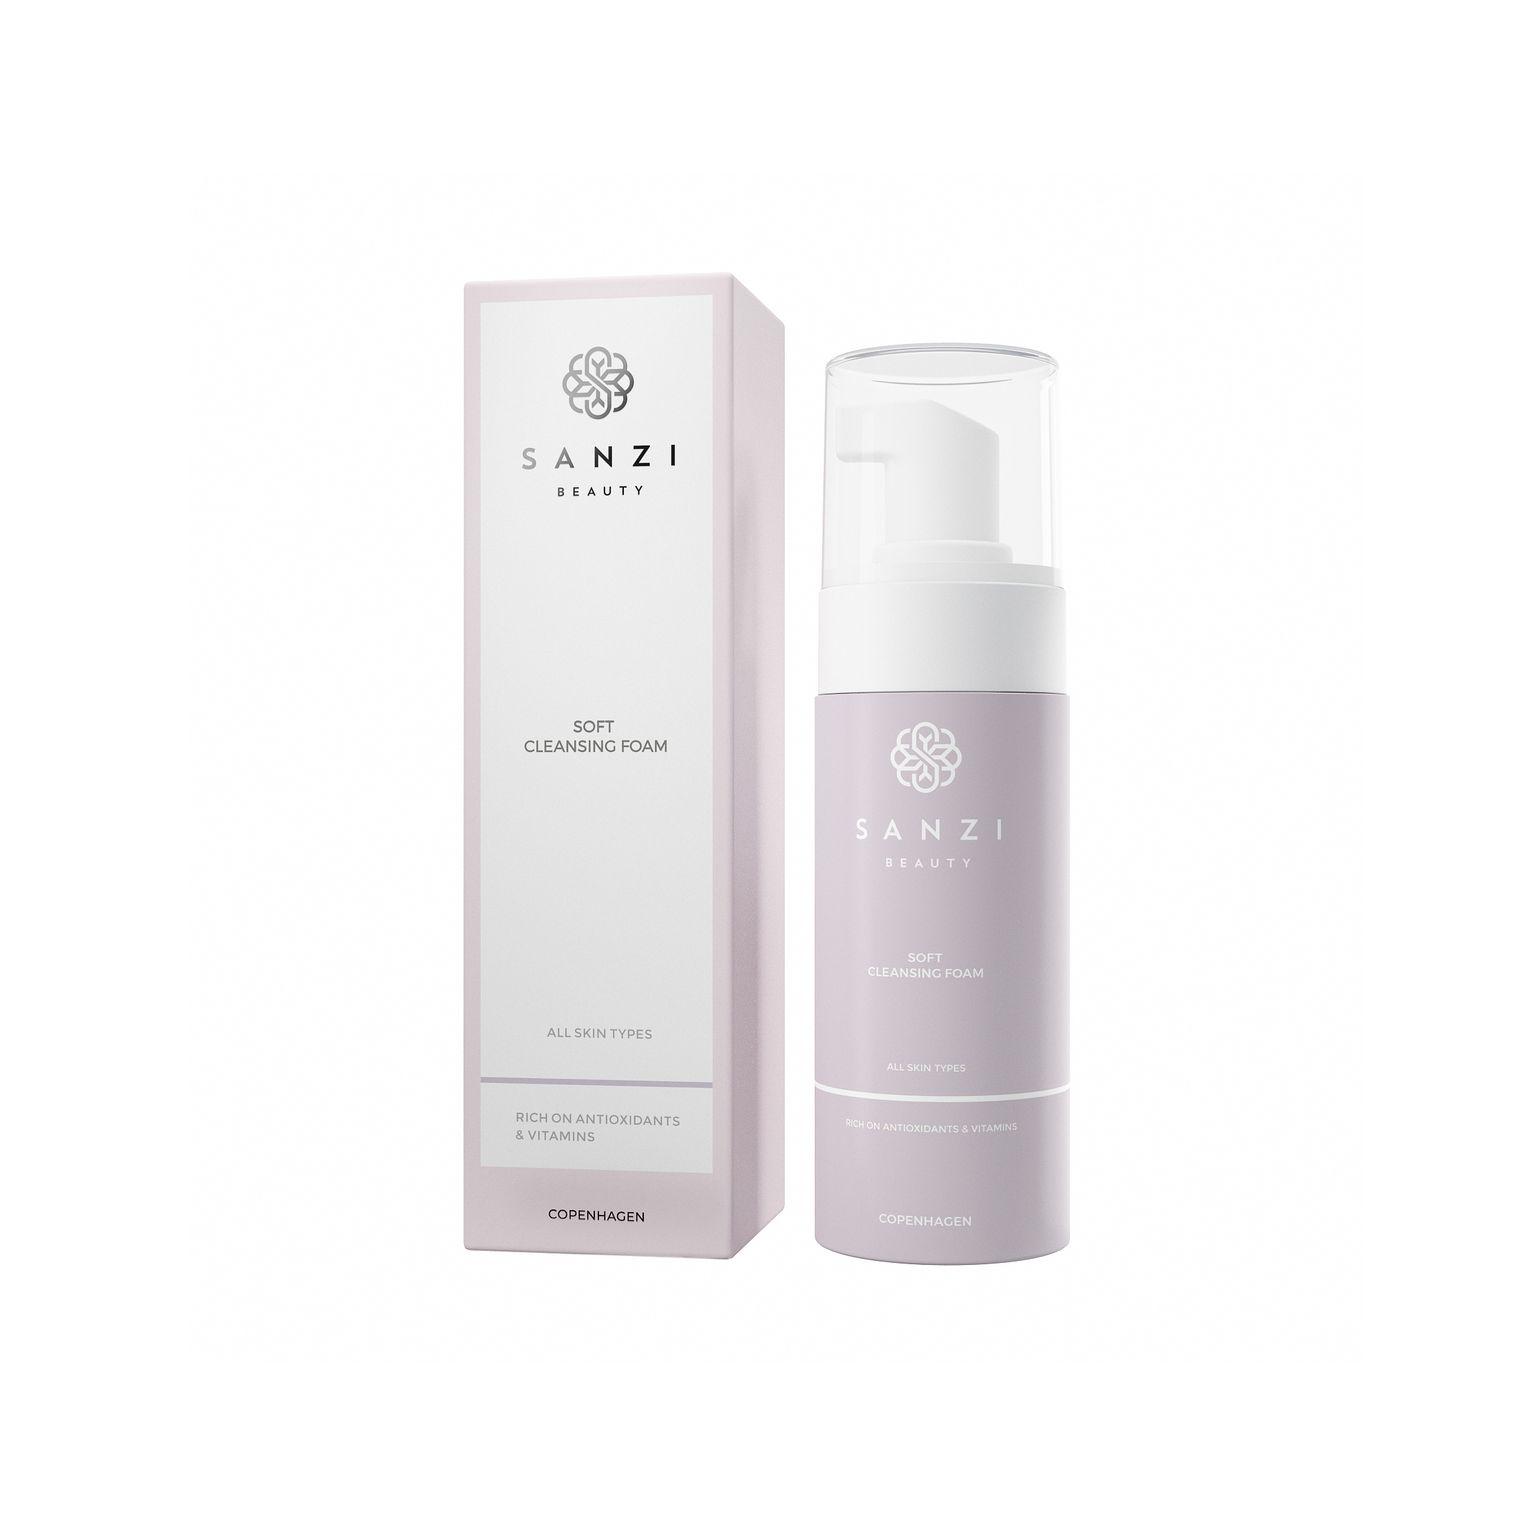 Sanzi Beauty Soft Cleansing Foam, 150 ml